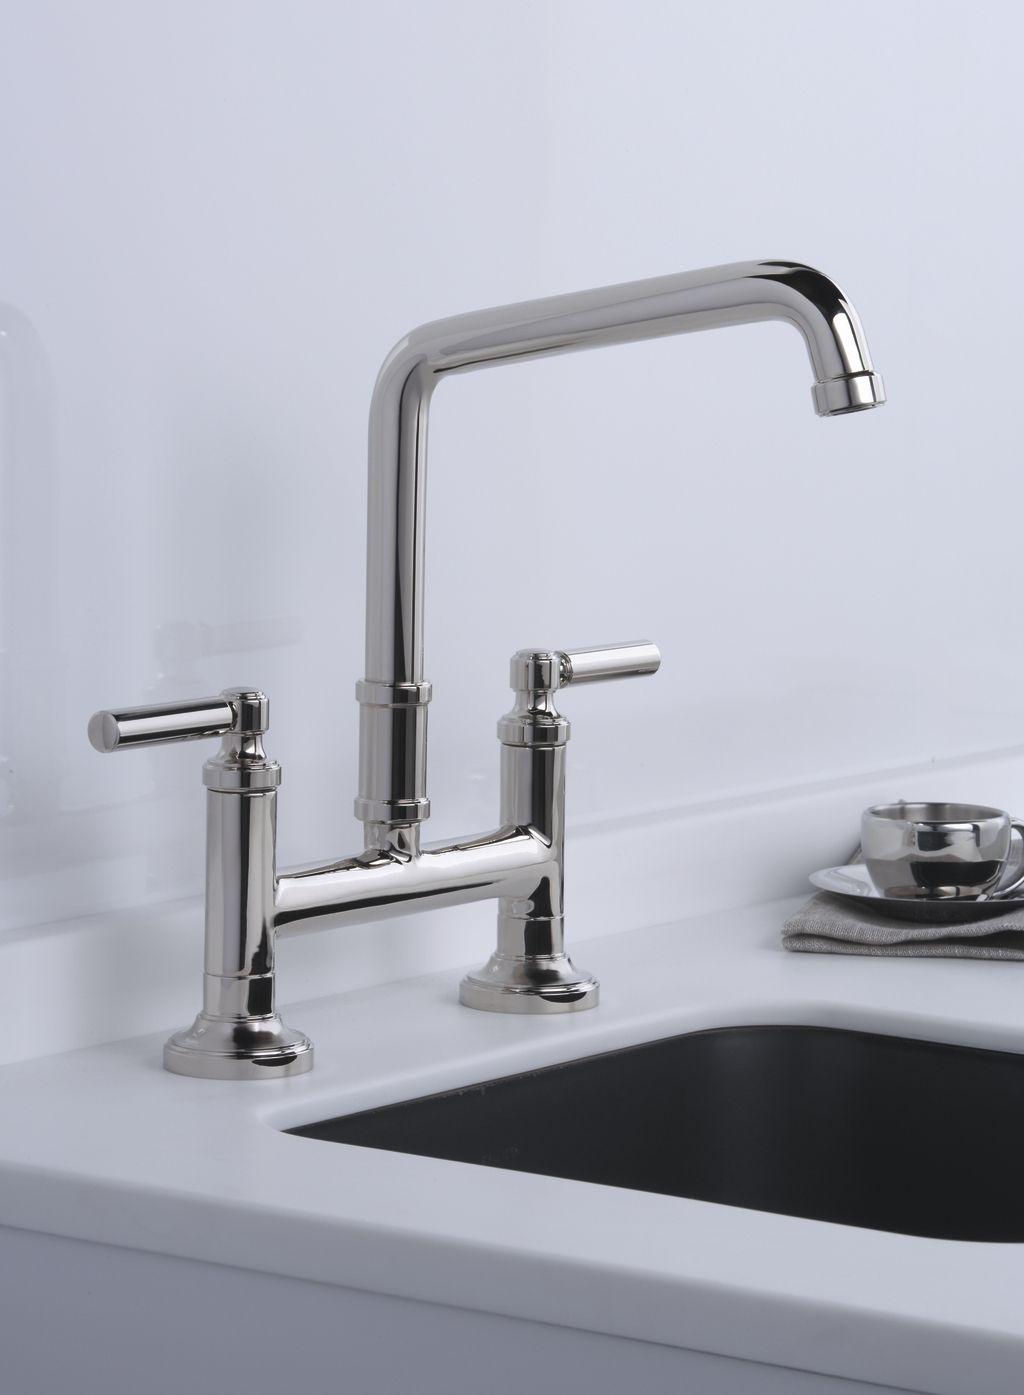 Kallista Quincy Bridge Kitchen Faucet, available at lav•ish-The ...